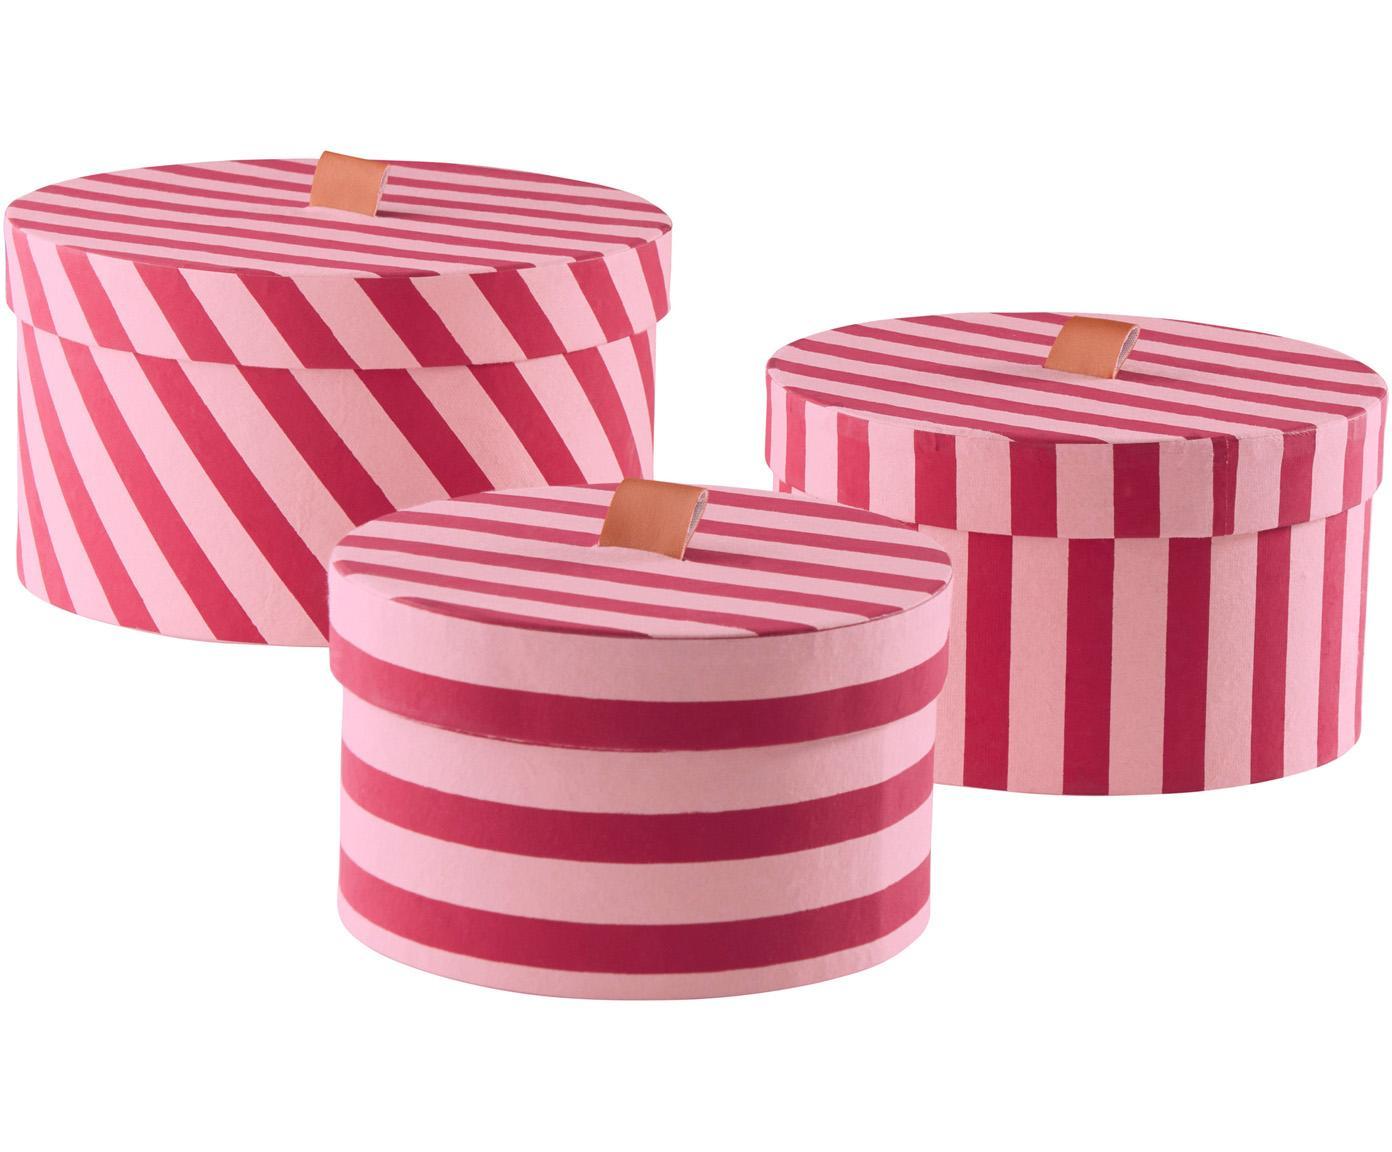 Opbergdozenset Dizzy, 3-delig, Karton, Roze, Verschillende formaten